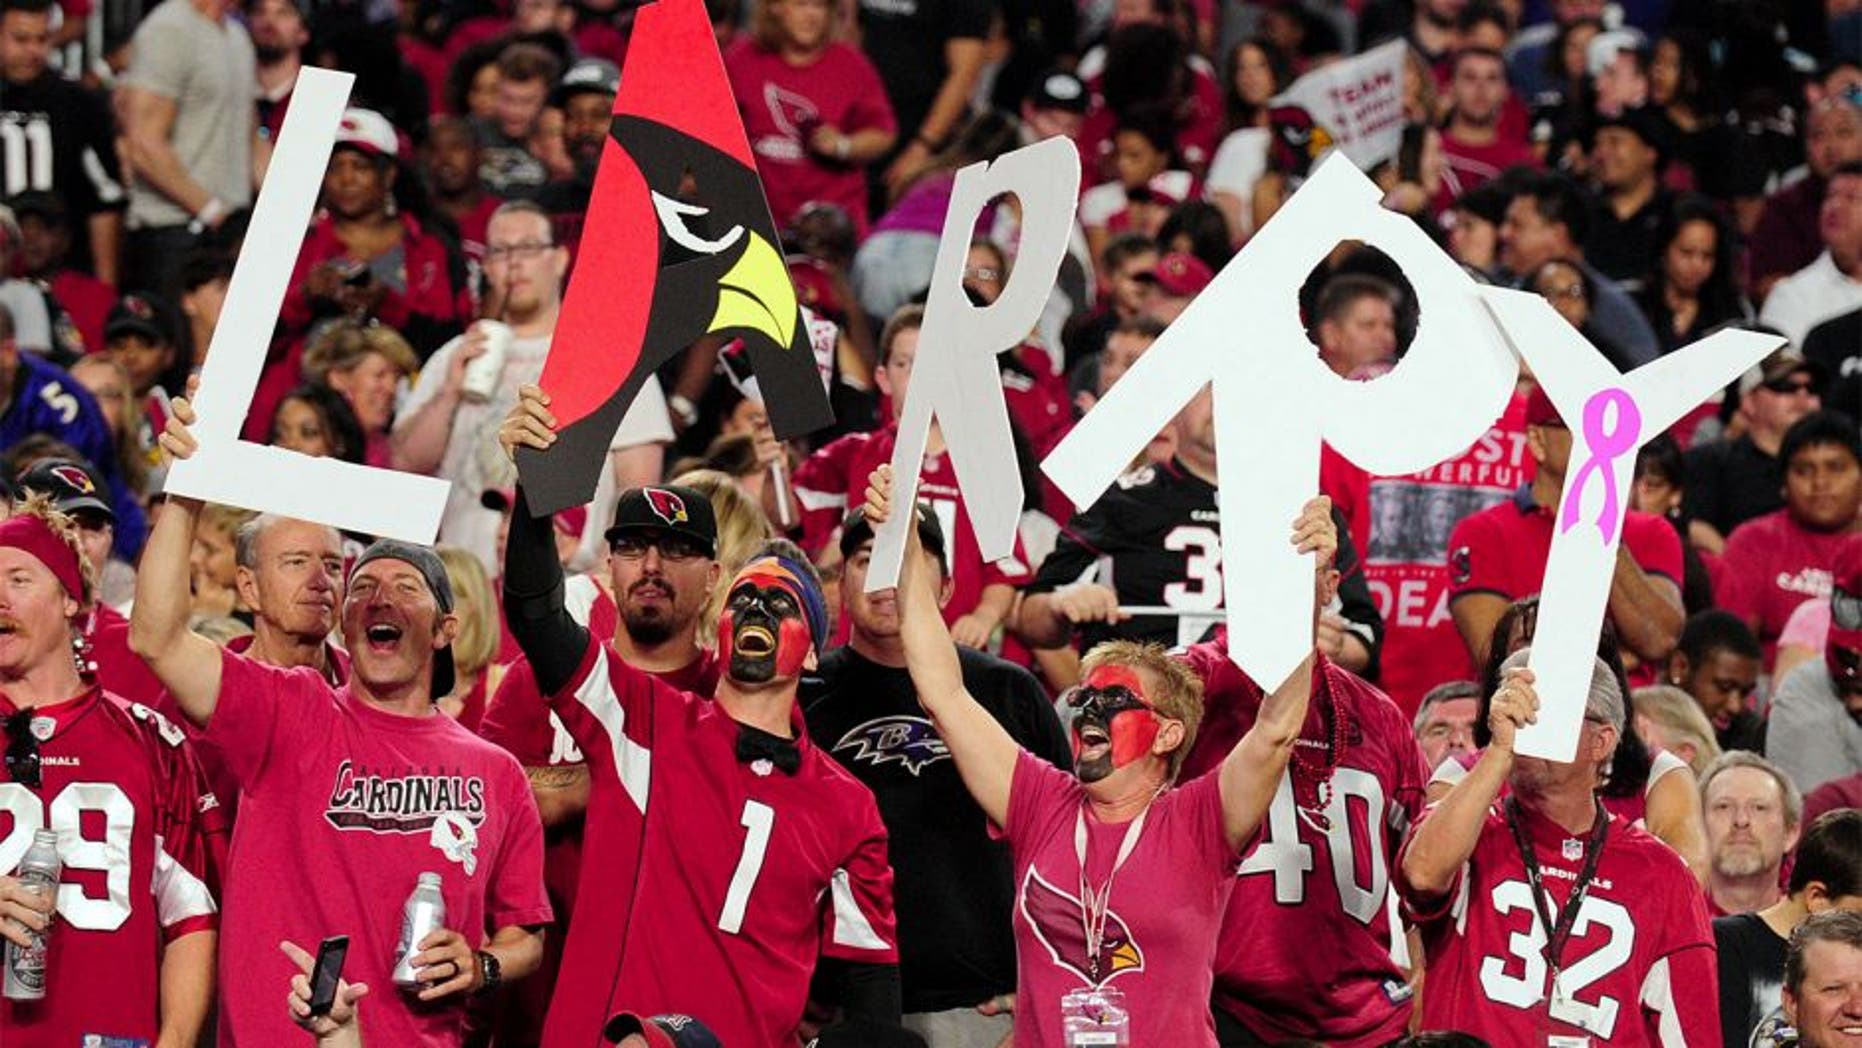 Oct 26, 2015; Glendale, AZ, USA; Arizona Cardinals fans cheers during the second half against the Baltimore Ravens at University of Phoenix Stadium. Mandatory Credit: Matt Kartozian-USA TODAY Sports